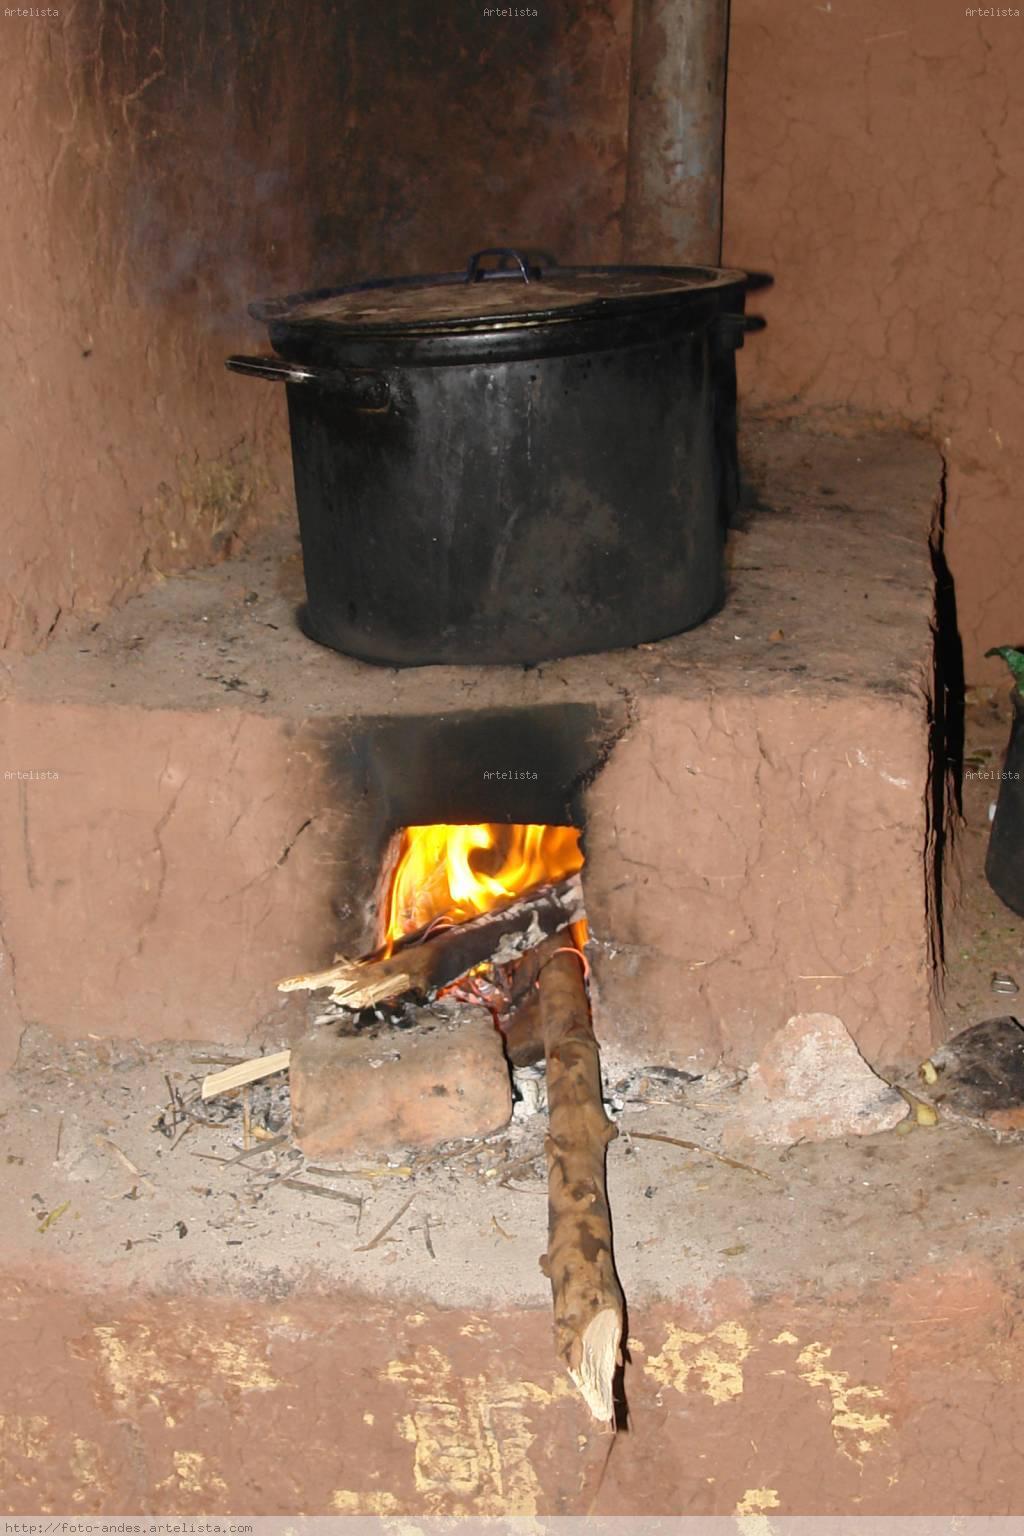 Cocina a le a ivan florez ojeda - Cocinas economicas de lena ...